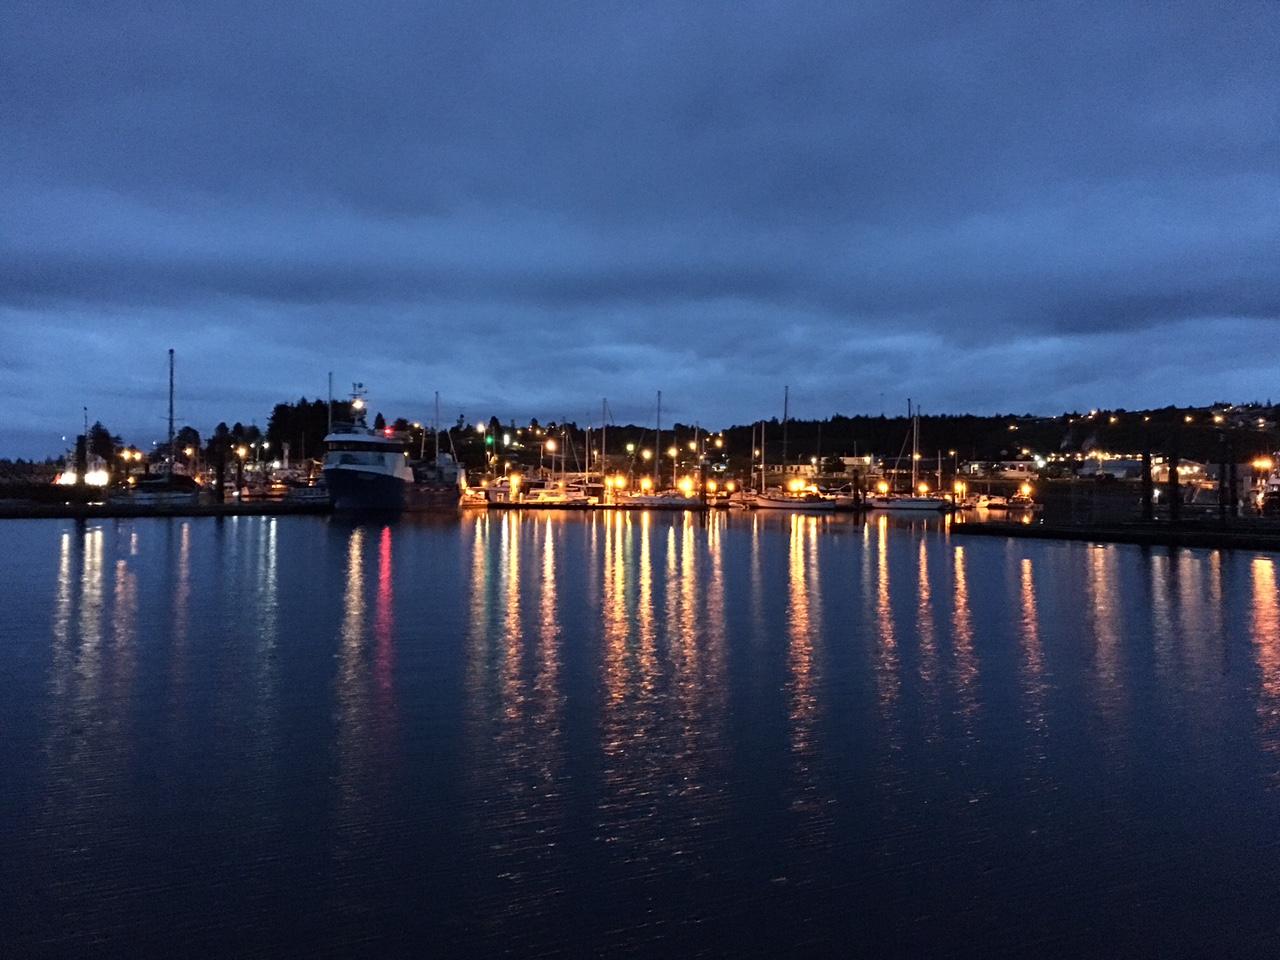 Port McNeill